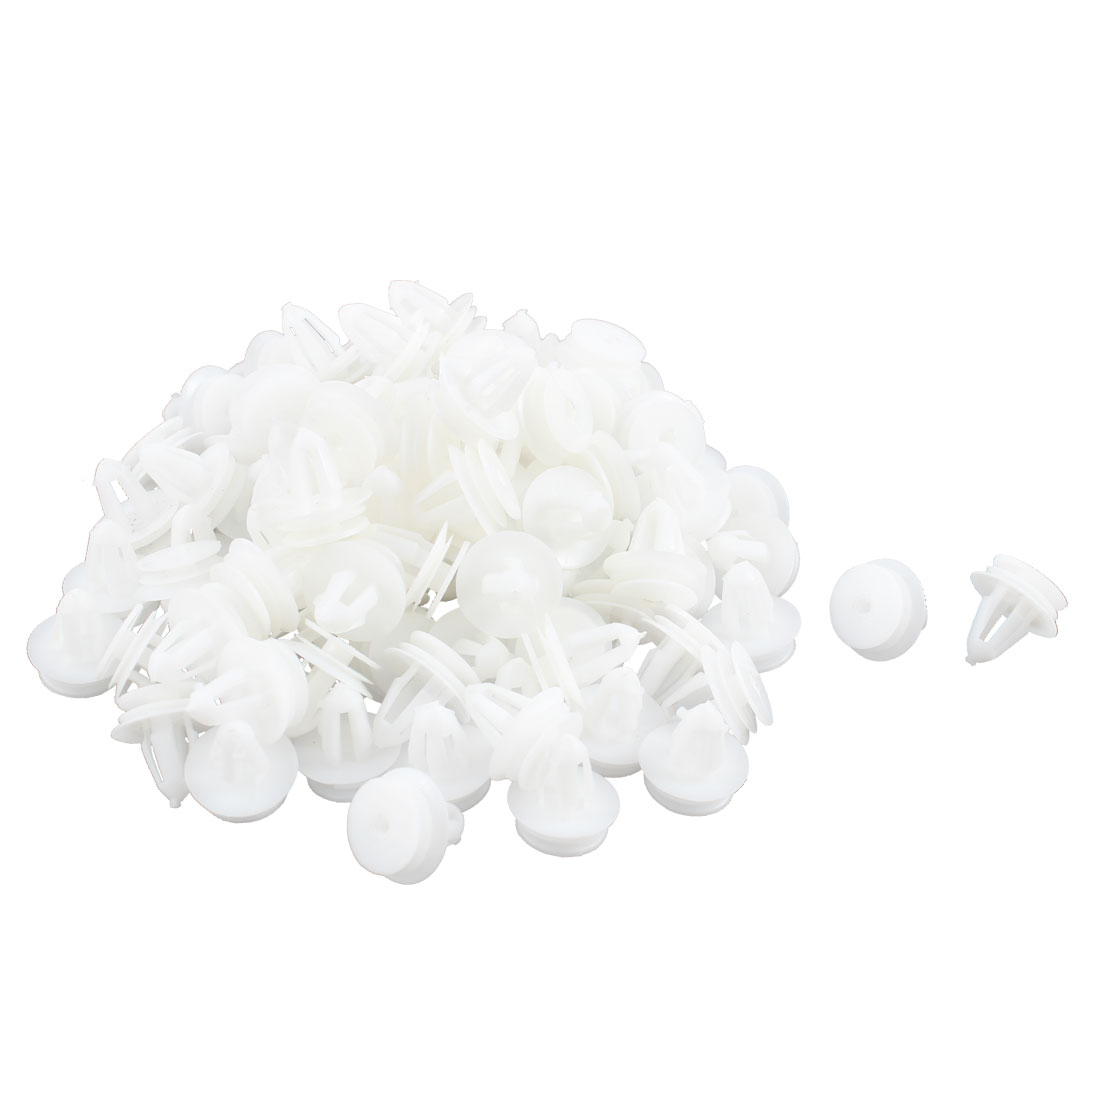 100 Pcs White Plastic Rivet Trim Fastener Retainer Clips 9mm x 13mm x 17mm